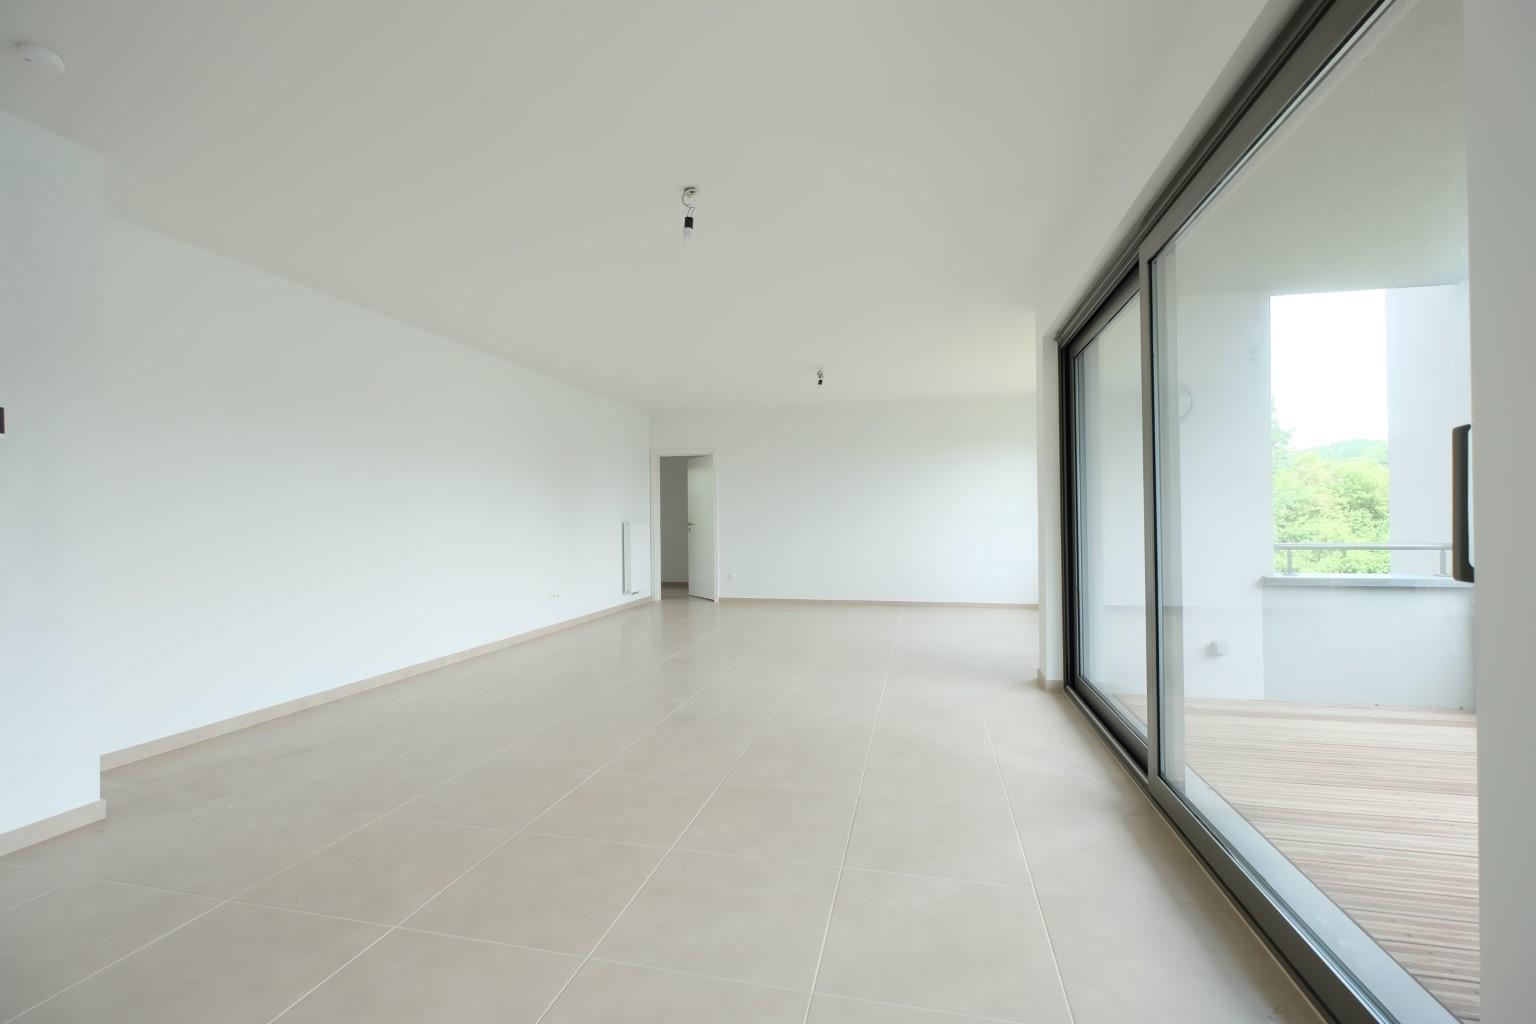 Appartement - Soignies - #3015957-14